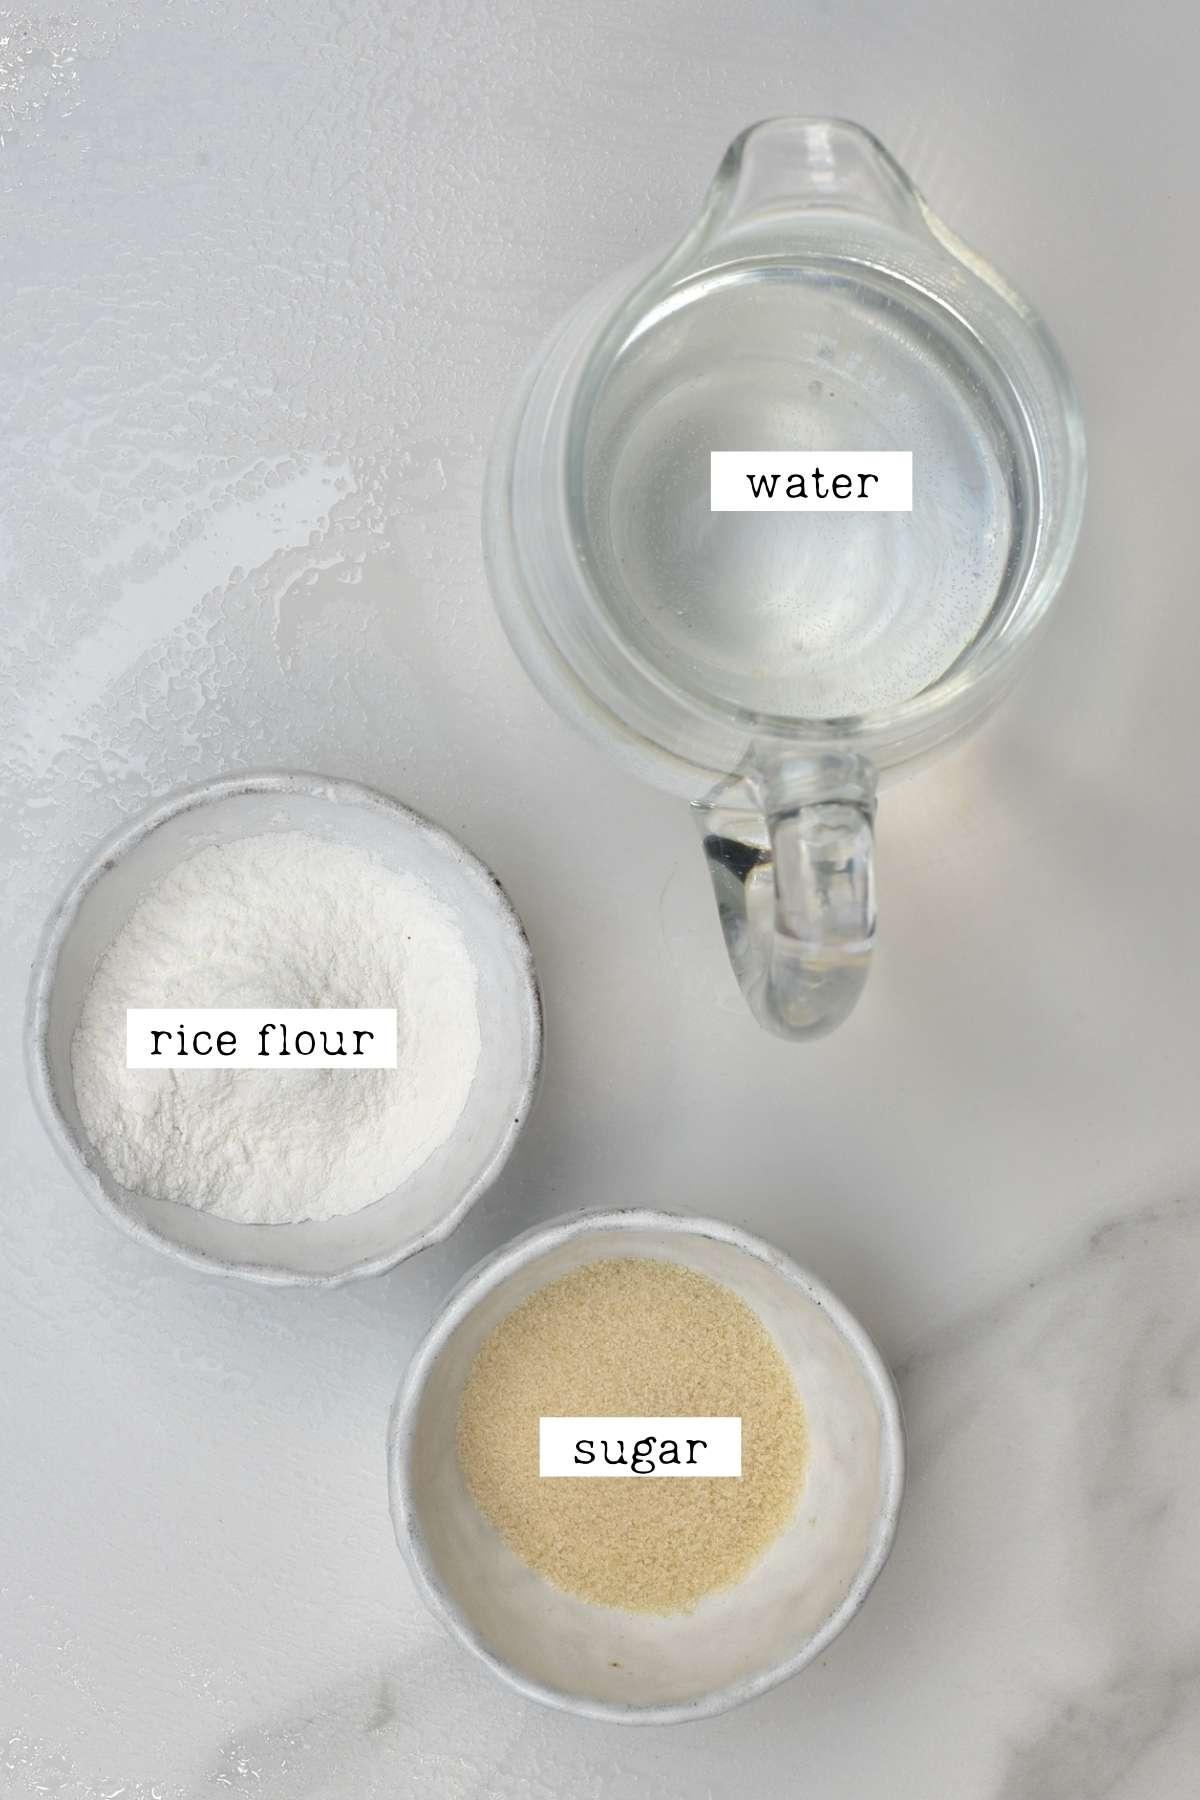 Porridge ingredients for kimchi